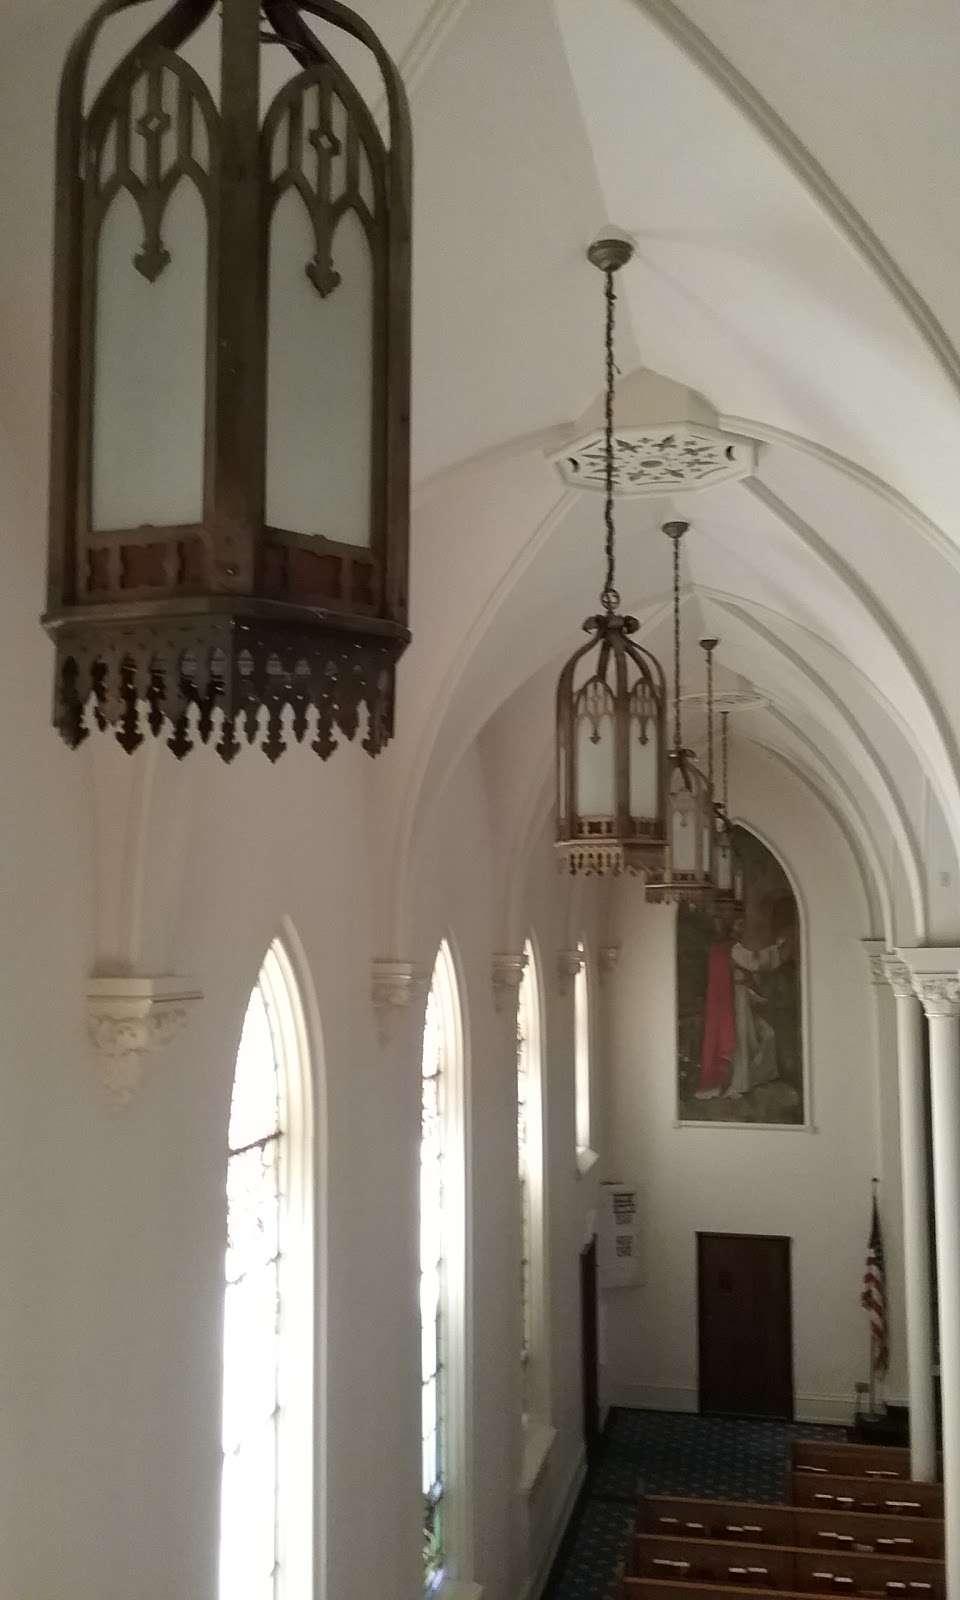 St. Lucas Lutheran Church - church  | Photo 8 of 10 | Address: 2605 S Kinnickinnic Ave, Milwaukee, WI 53207, USA | Phone: (414) 483-9122